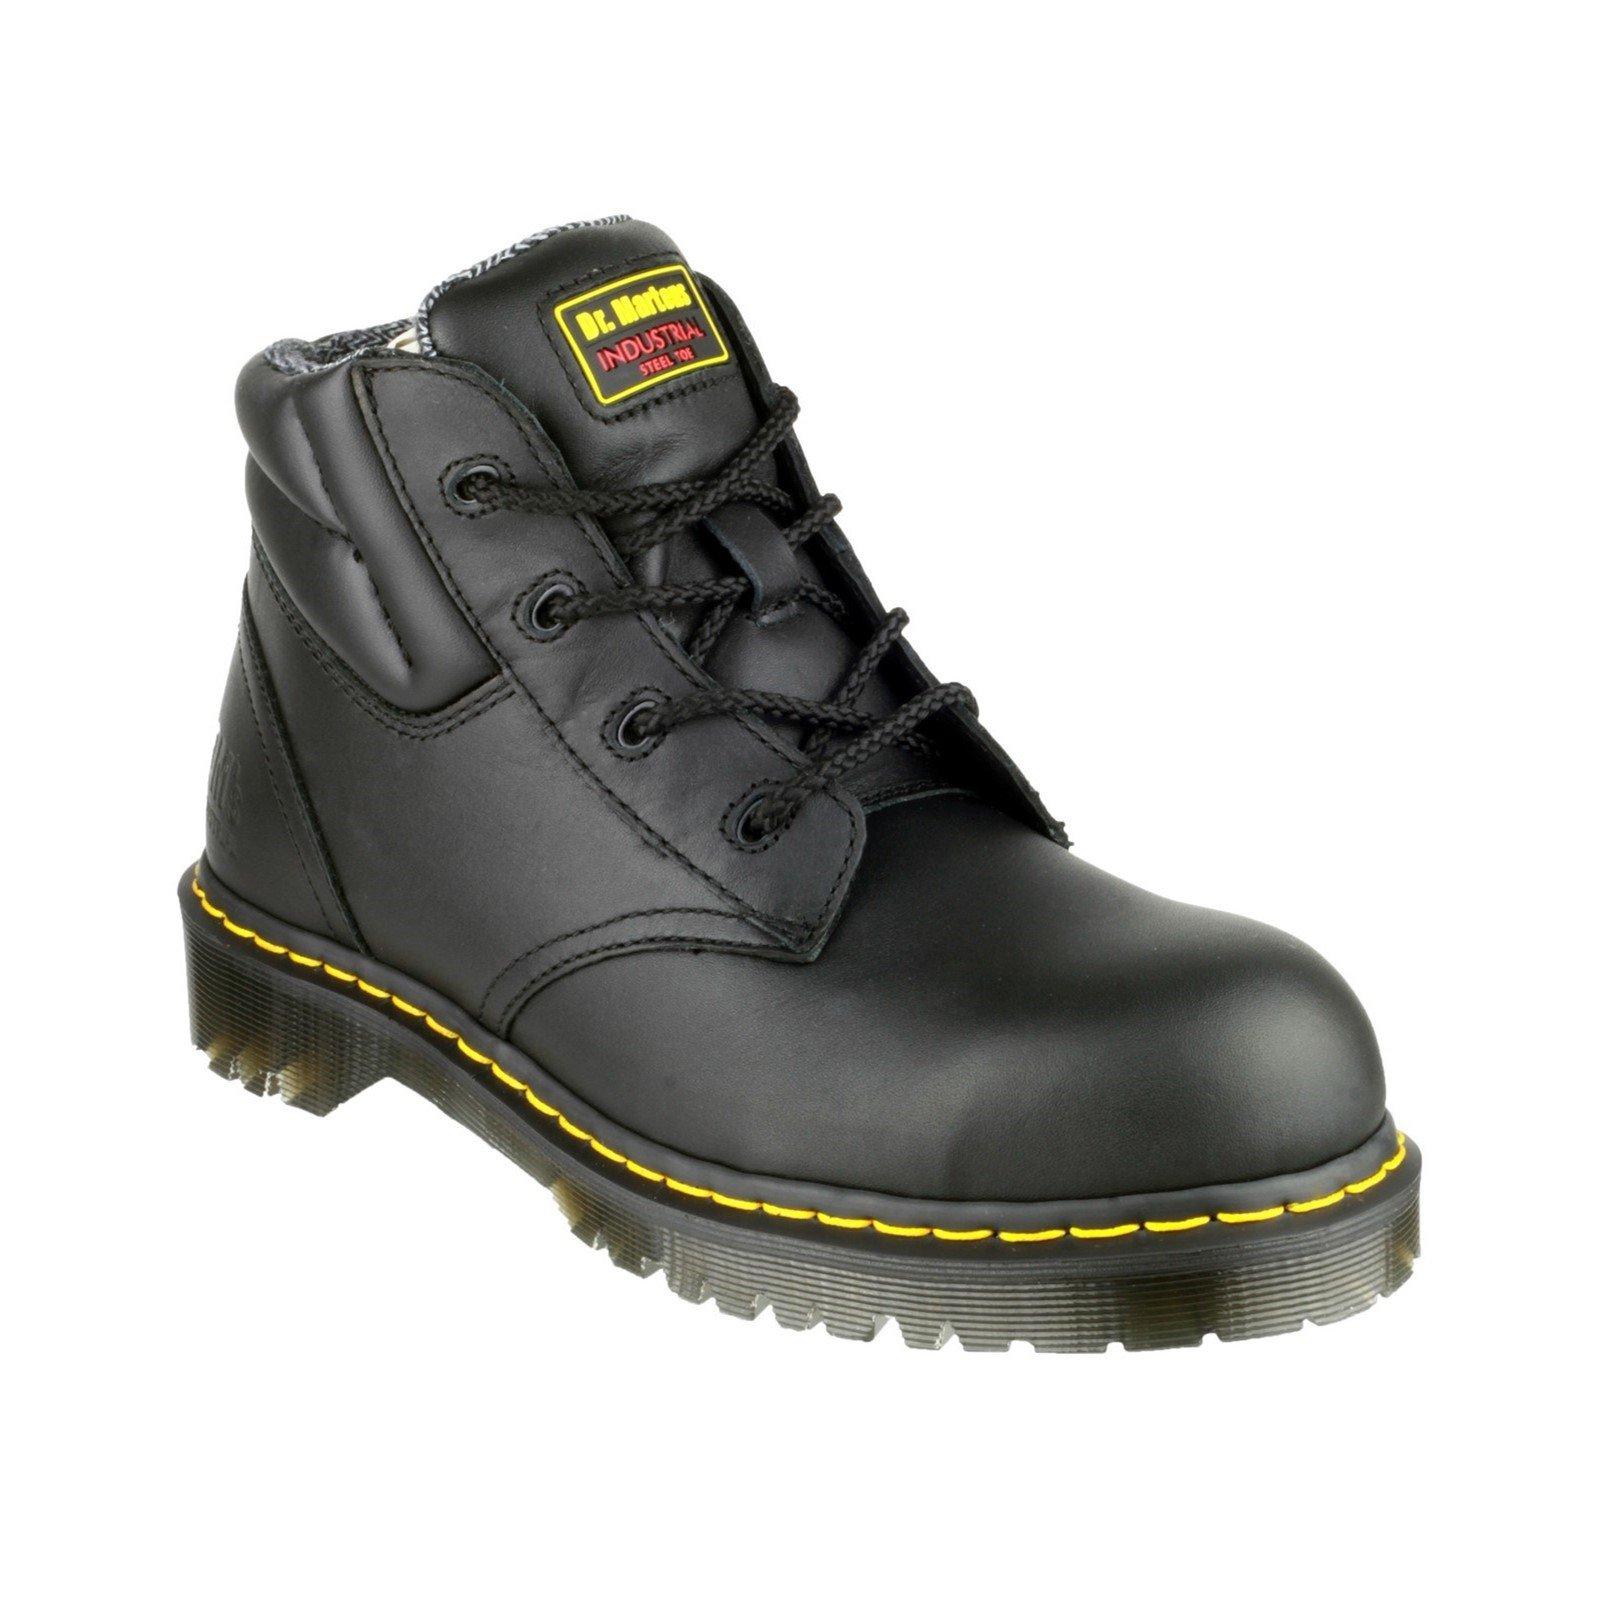 Dr Martens Unisex Lace-Up Boot Black 14068 - Black 8